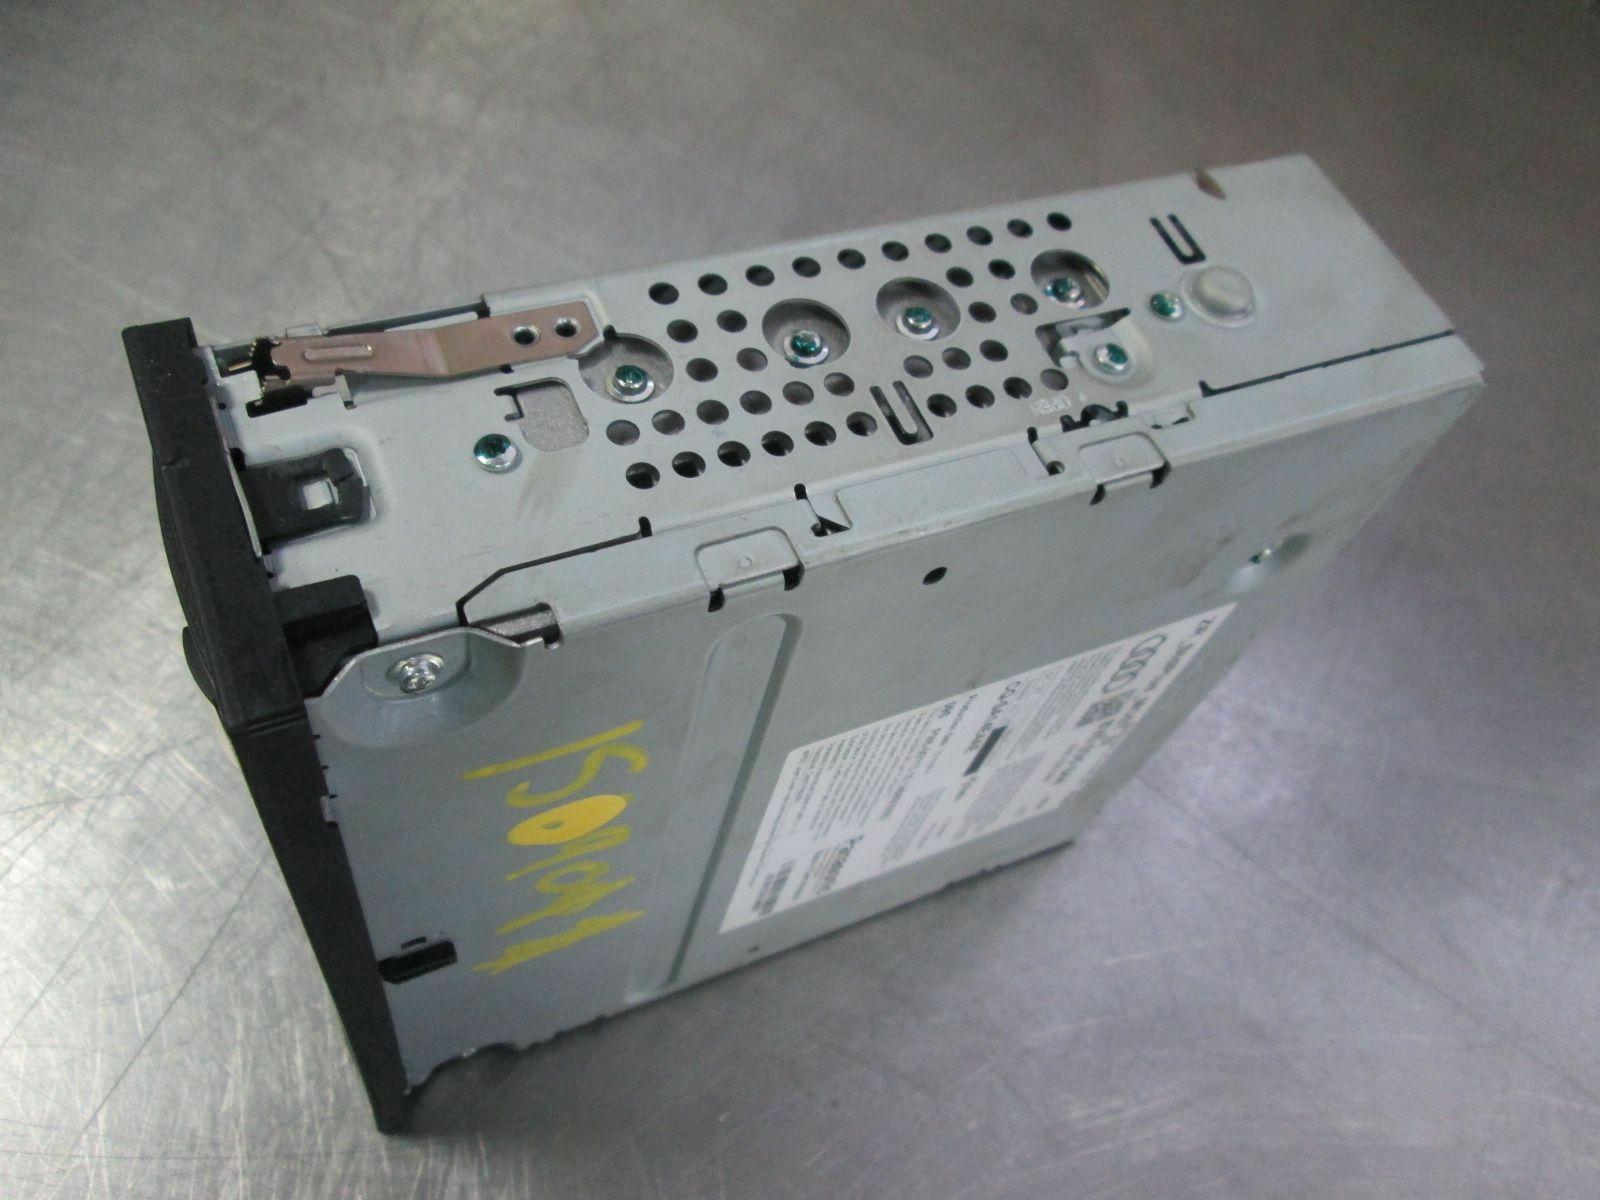 MMI Multimedia CD SD Disc Reader Player HD Radio 8V0035844 OEM Audi A3 S3  15-16